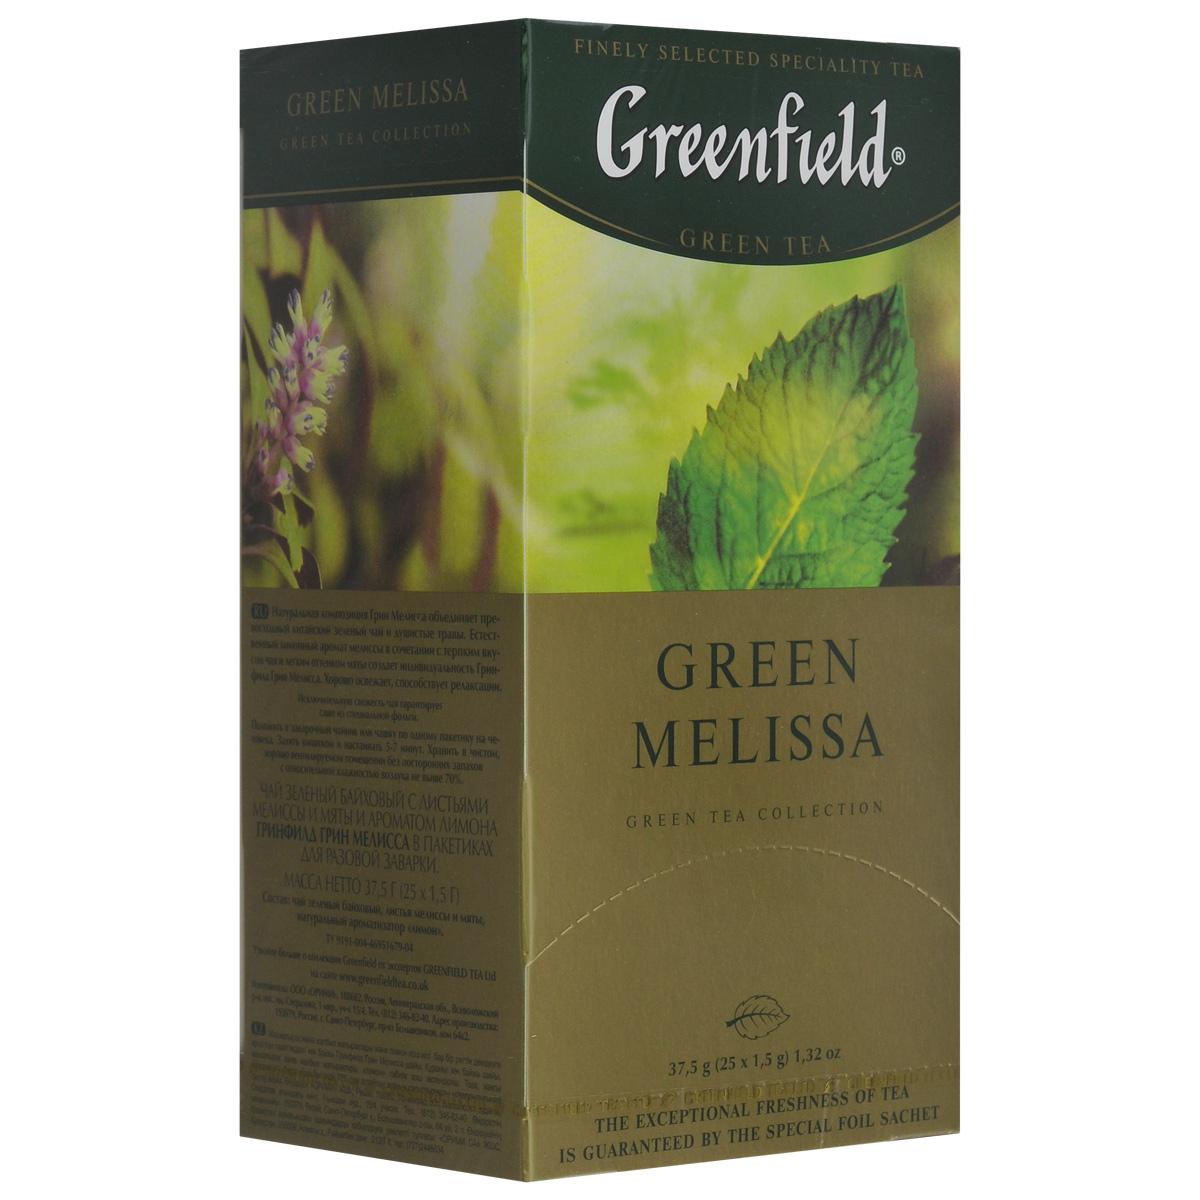 Greenfield Green Melissa зеленый чай в пакетиках, 25 шт melissa me485awtau54 melissa